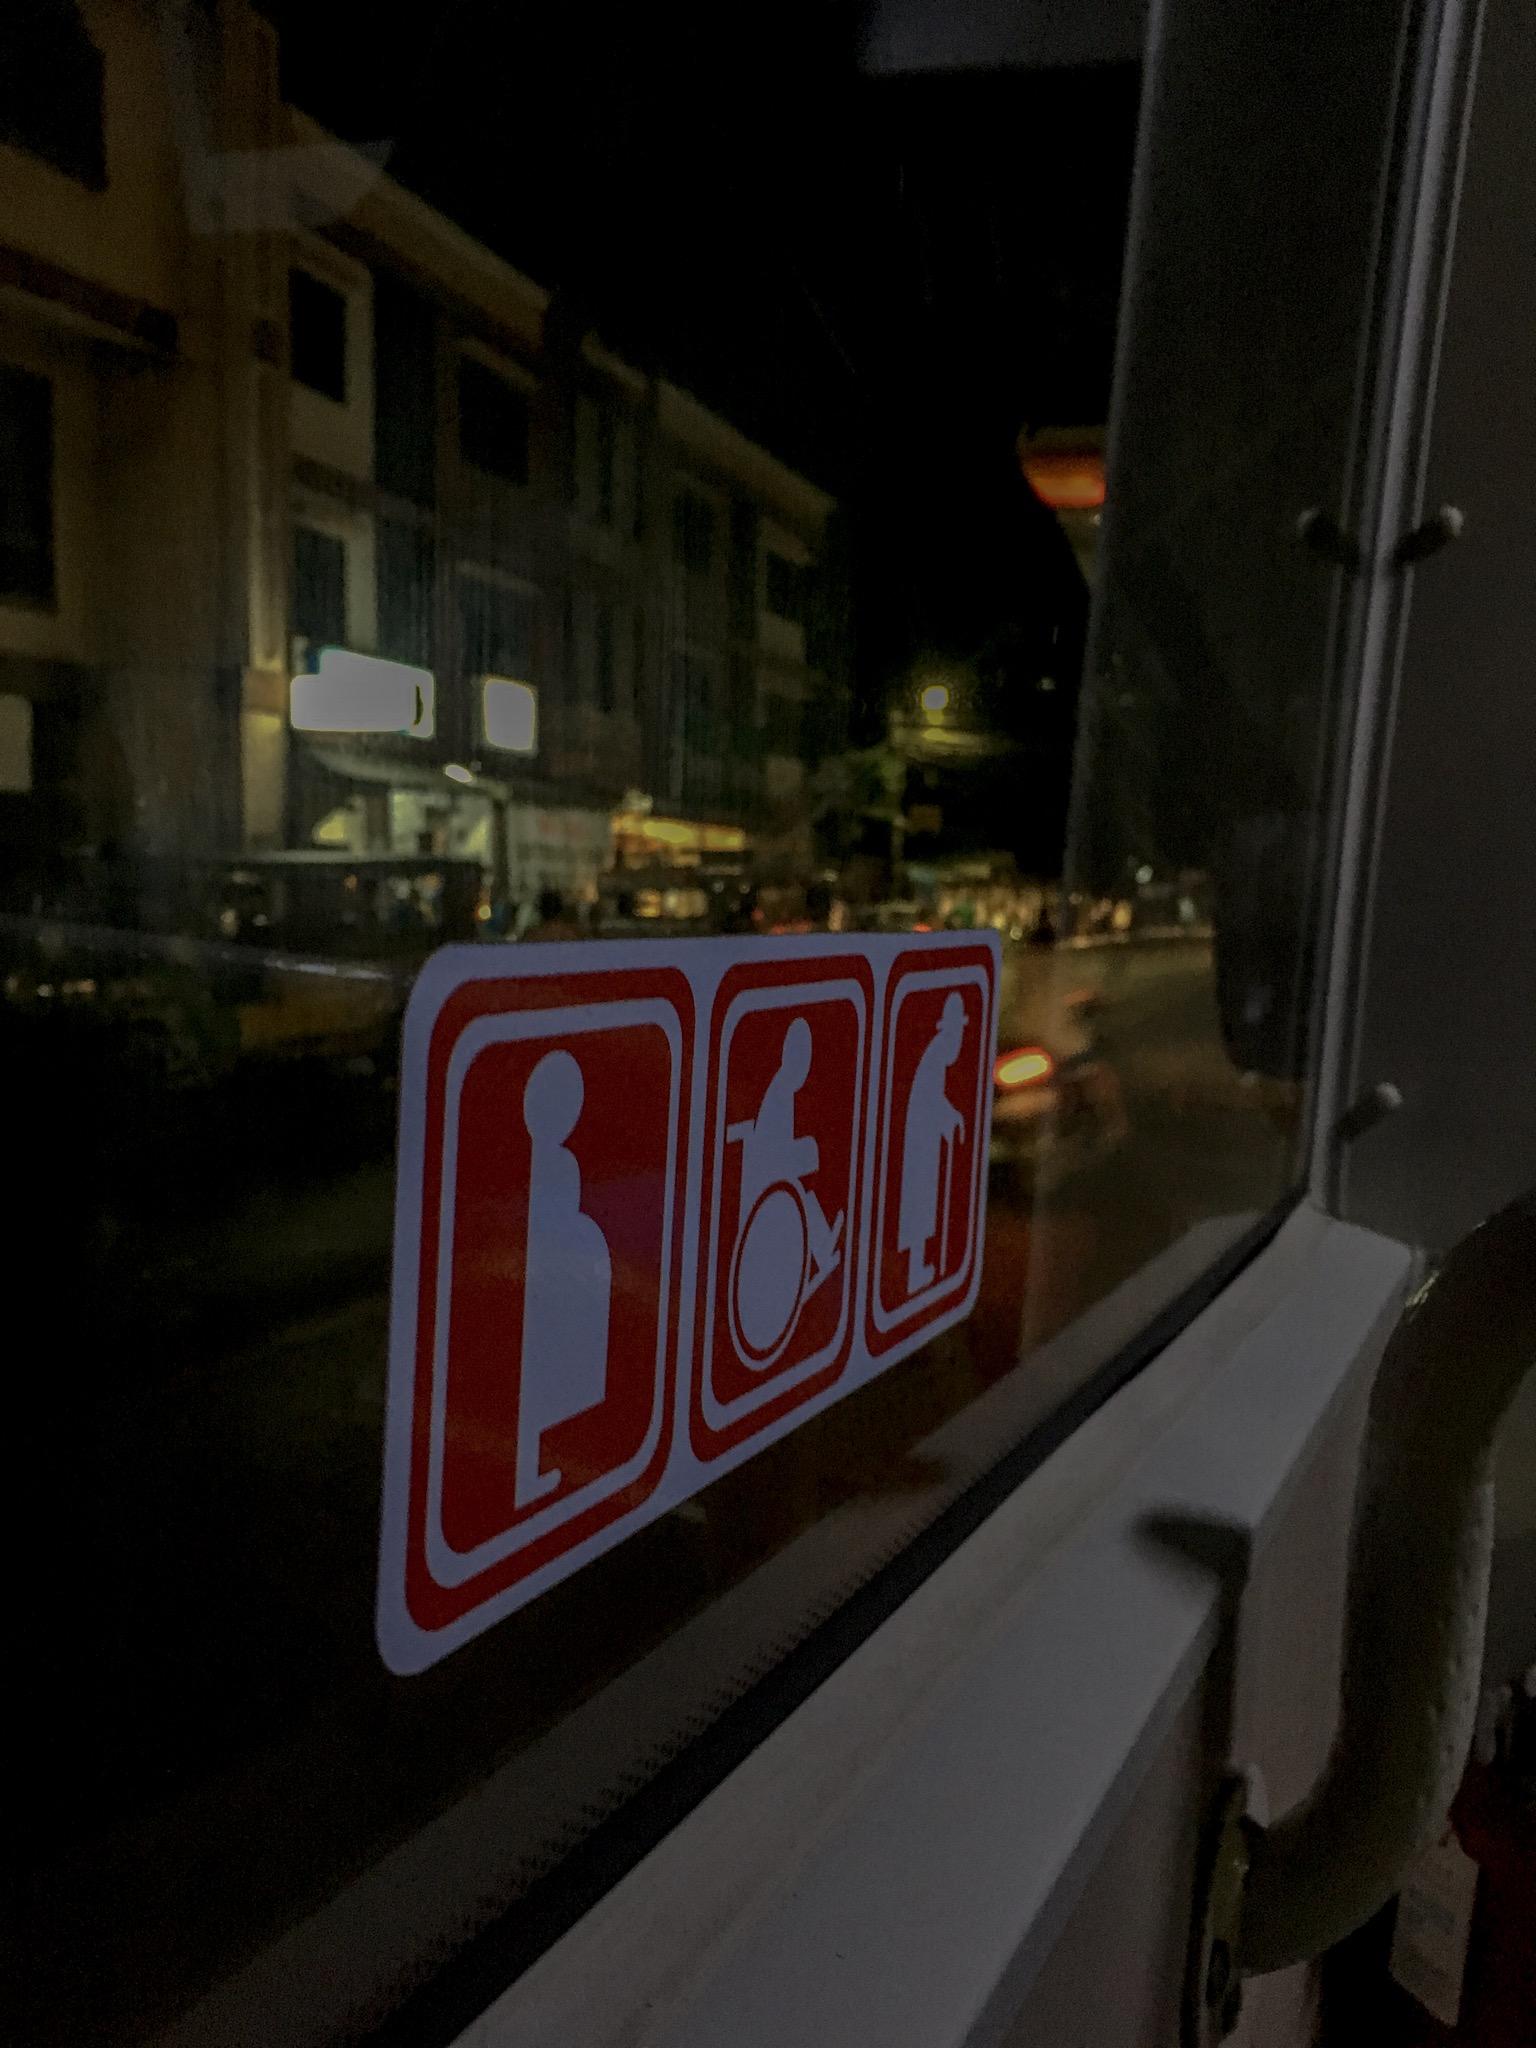 beep_bus_in_cebu